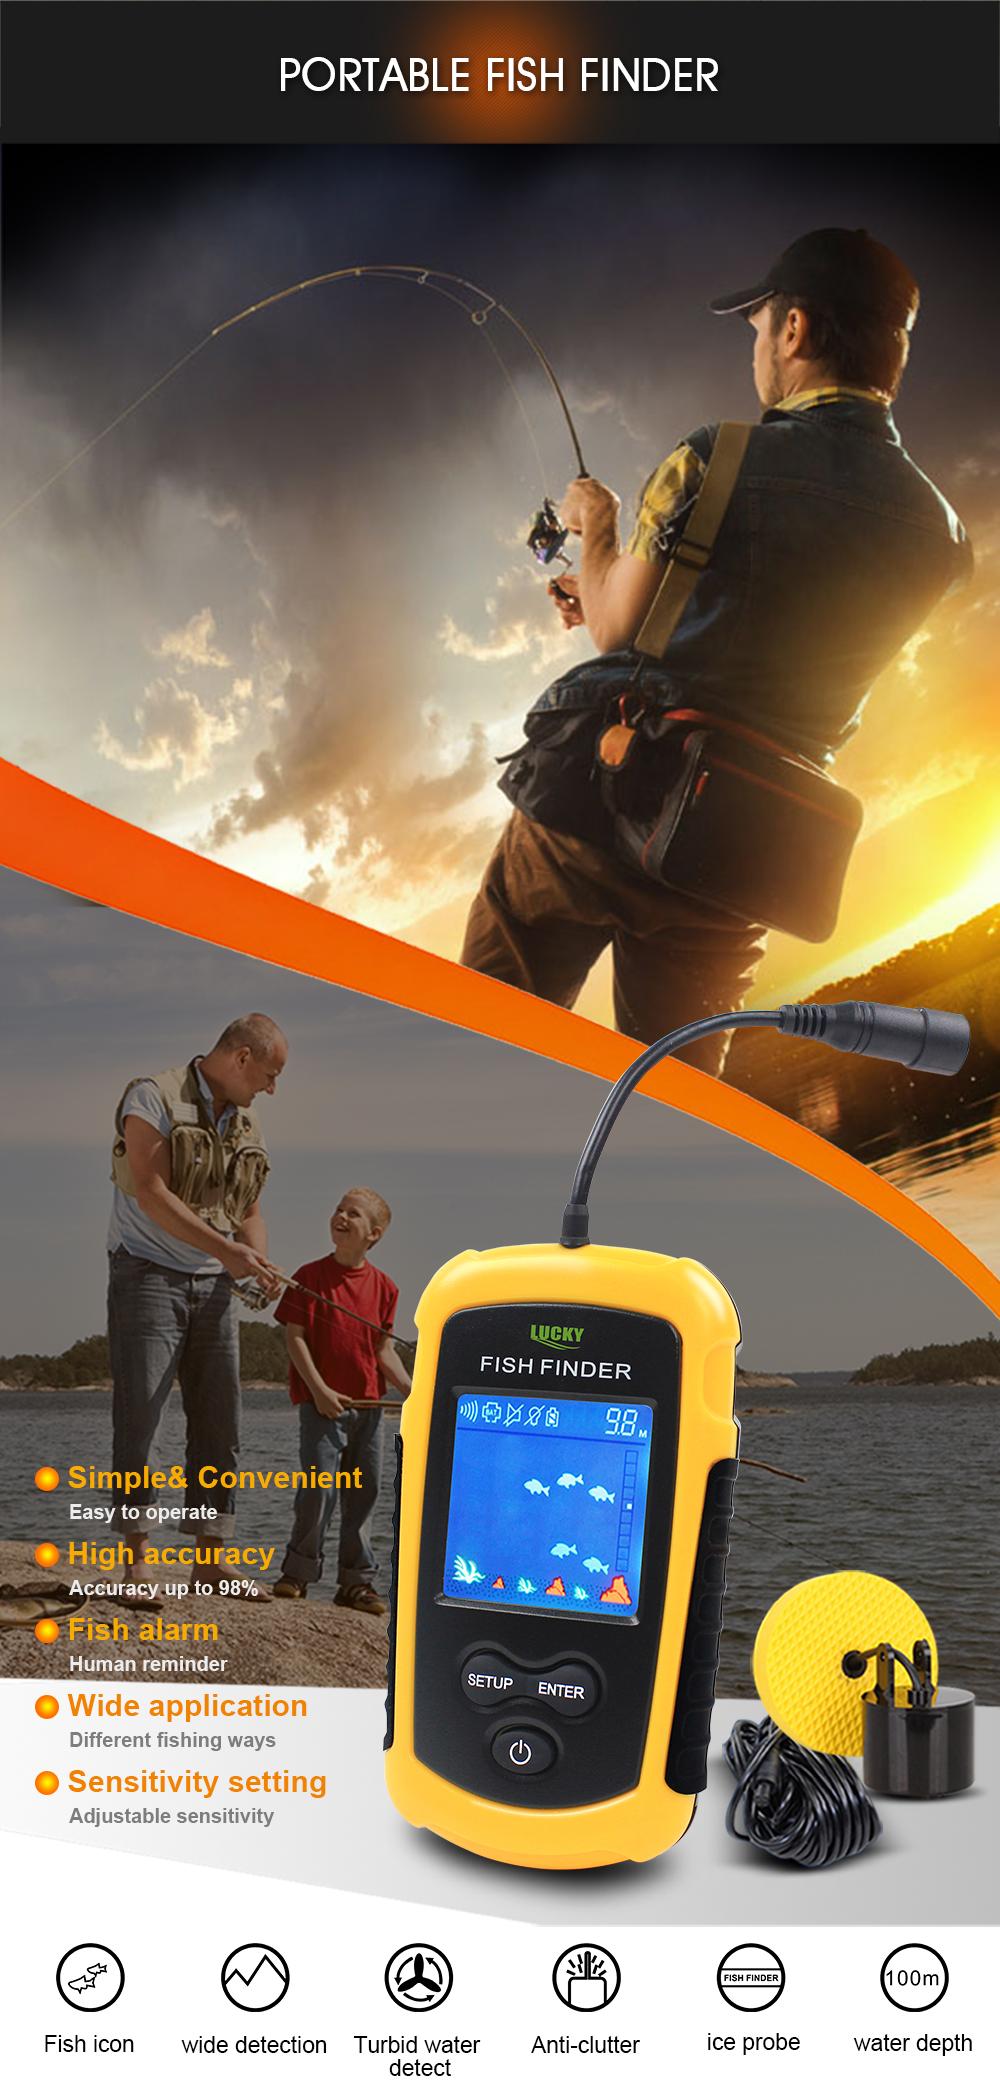 FF1108-1 fish finder